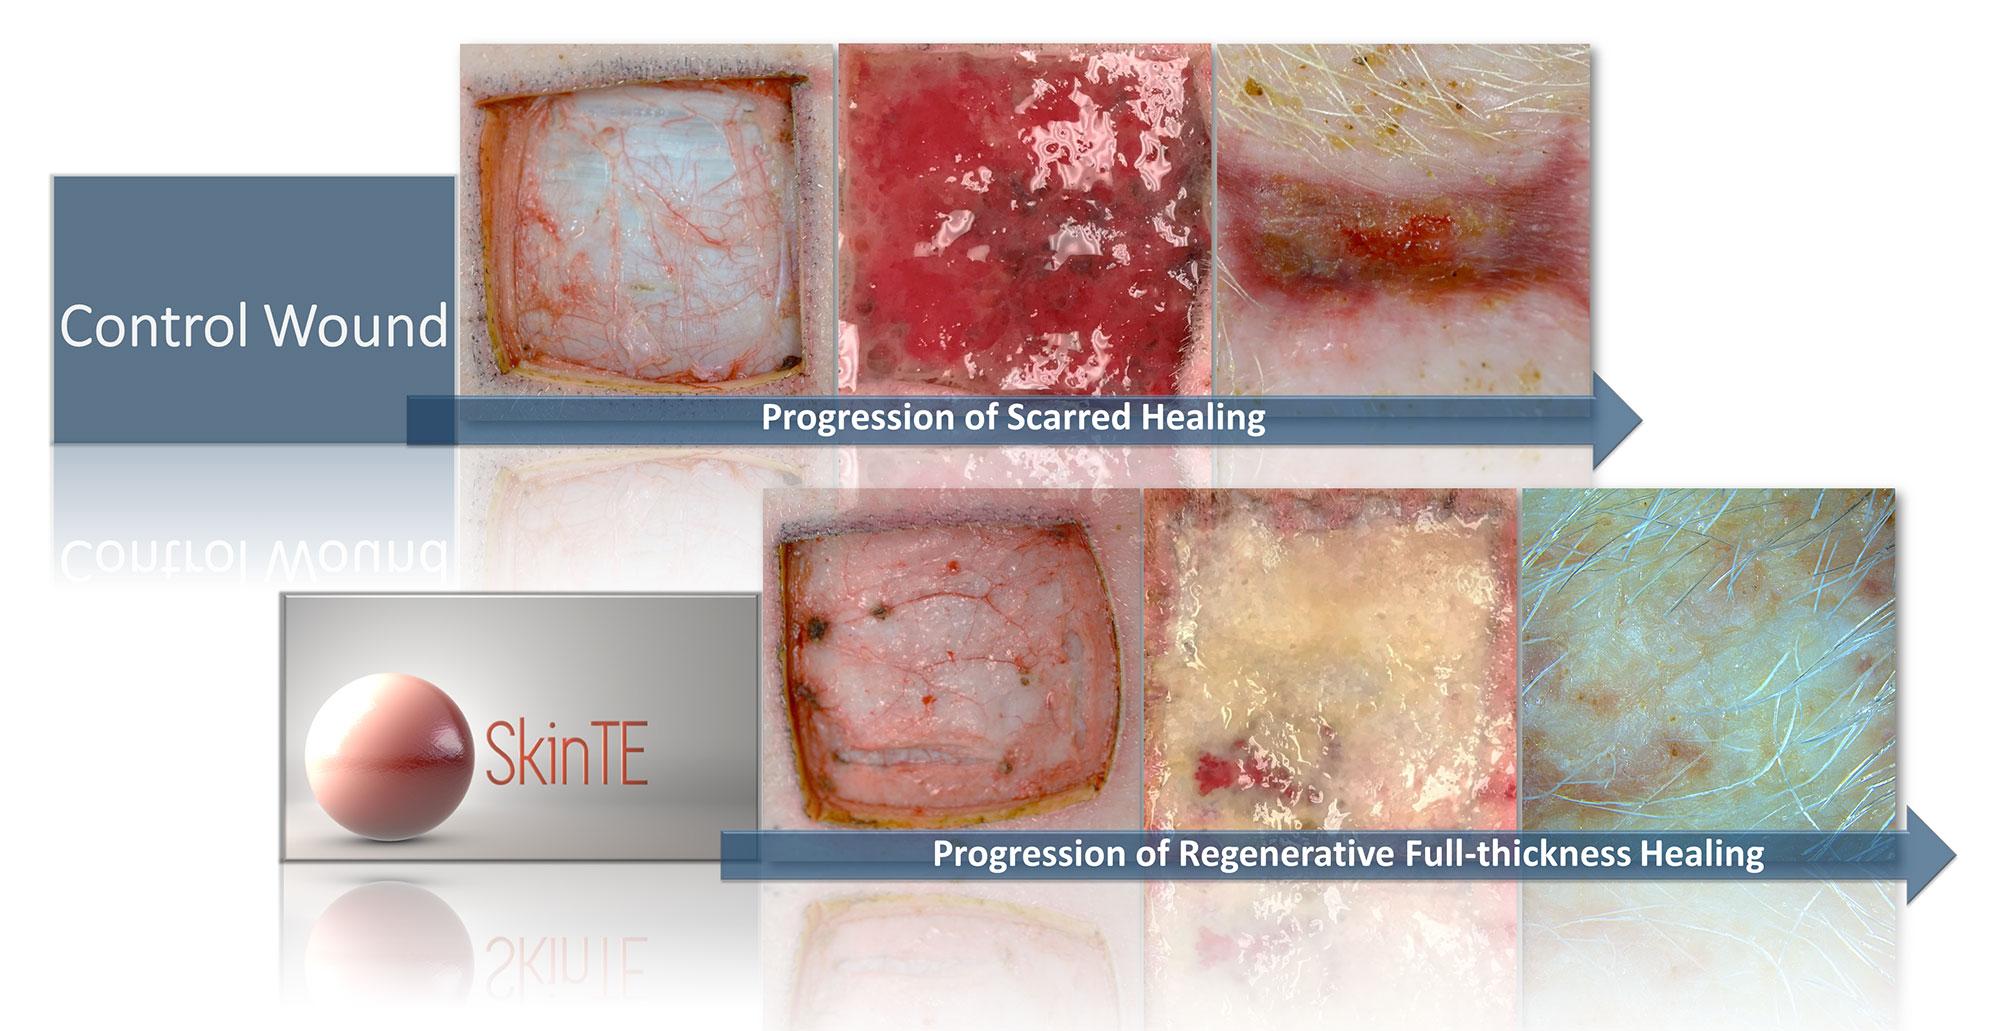 SkinTE Regenerative Progression